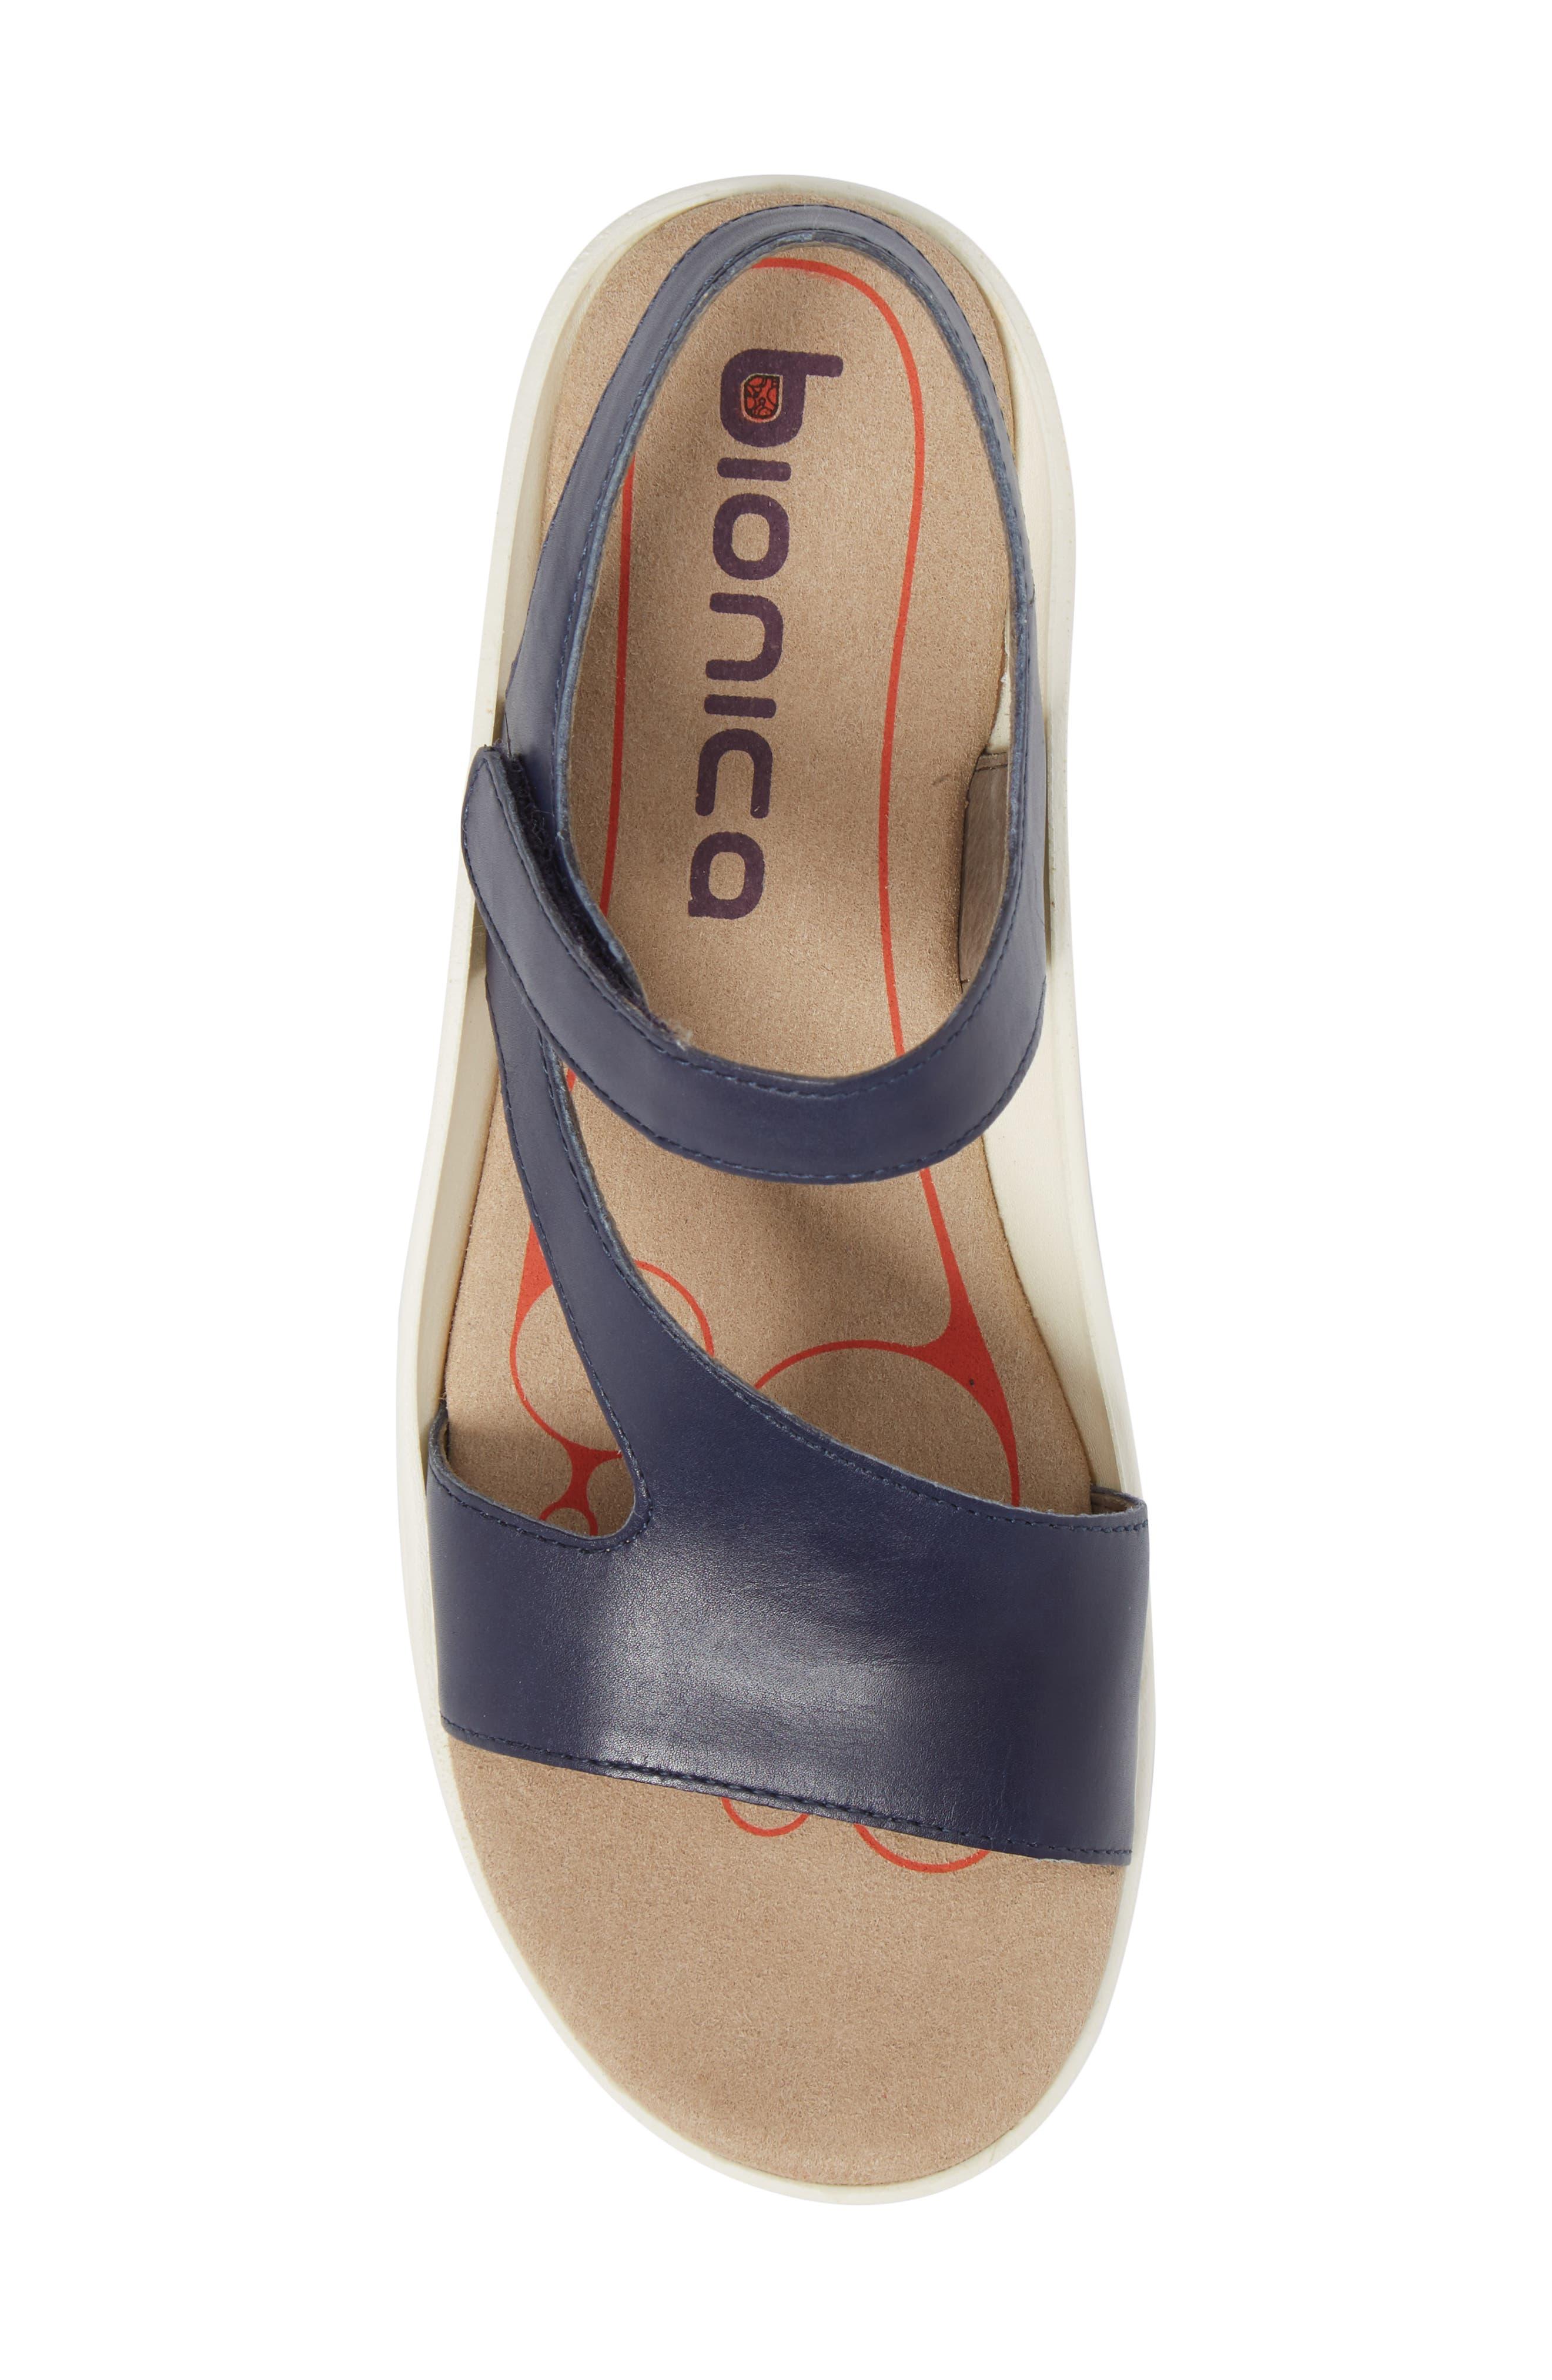 Cybele Platform Sandal,                             Alternate thumbnail 5, color,                             PEACOAT NAVY LEATHER